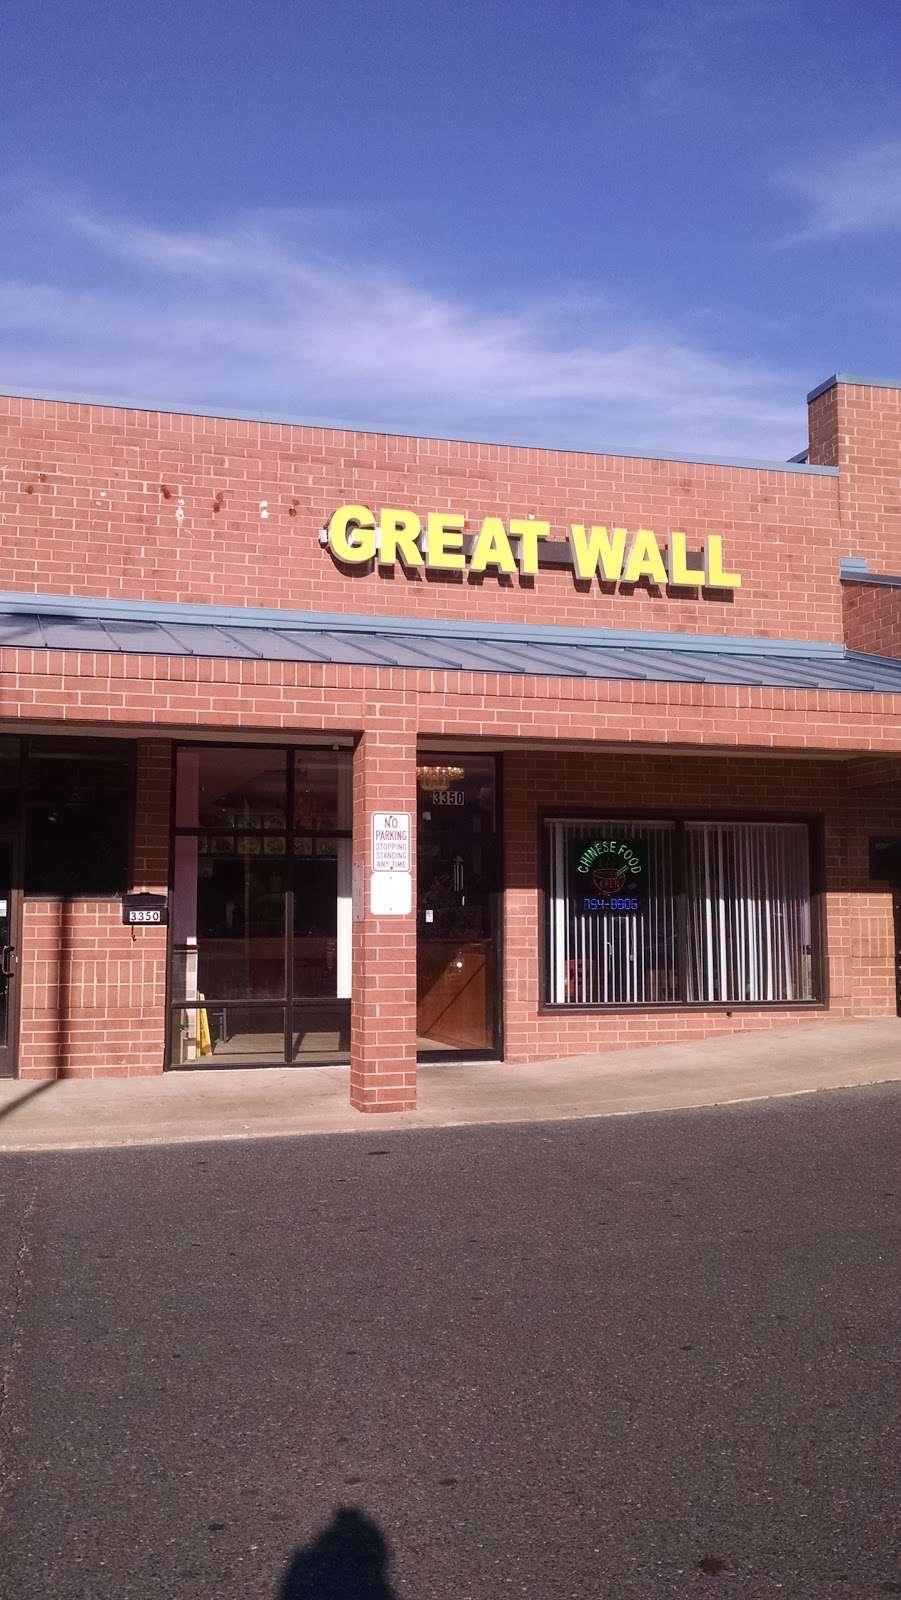 Great Wall Restaurant - restaurant  | Photo 2 of 6 | Address: 3350 Hayman Dr, Federalsburg, MD 21632, USA | Phone: (410) 754-8806